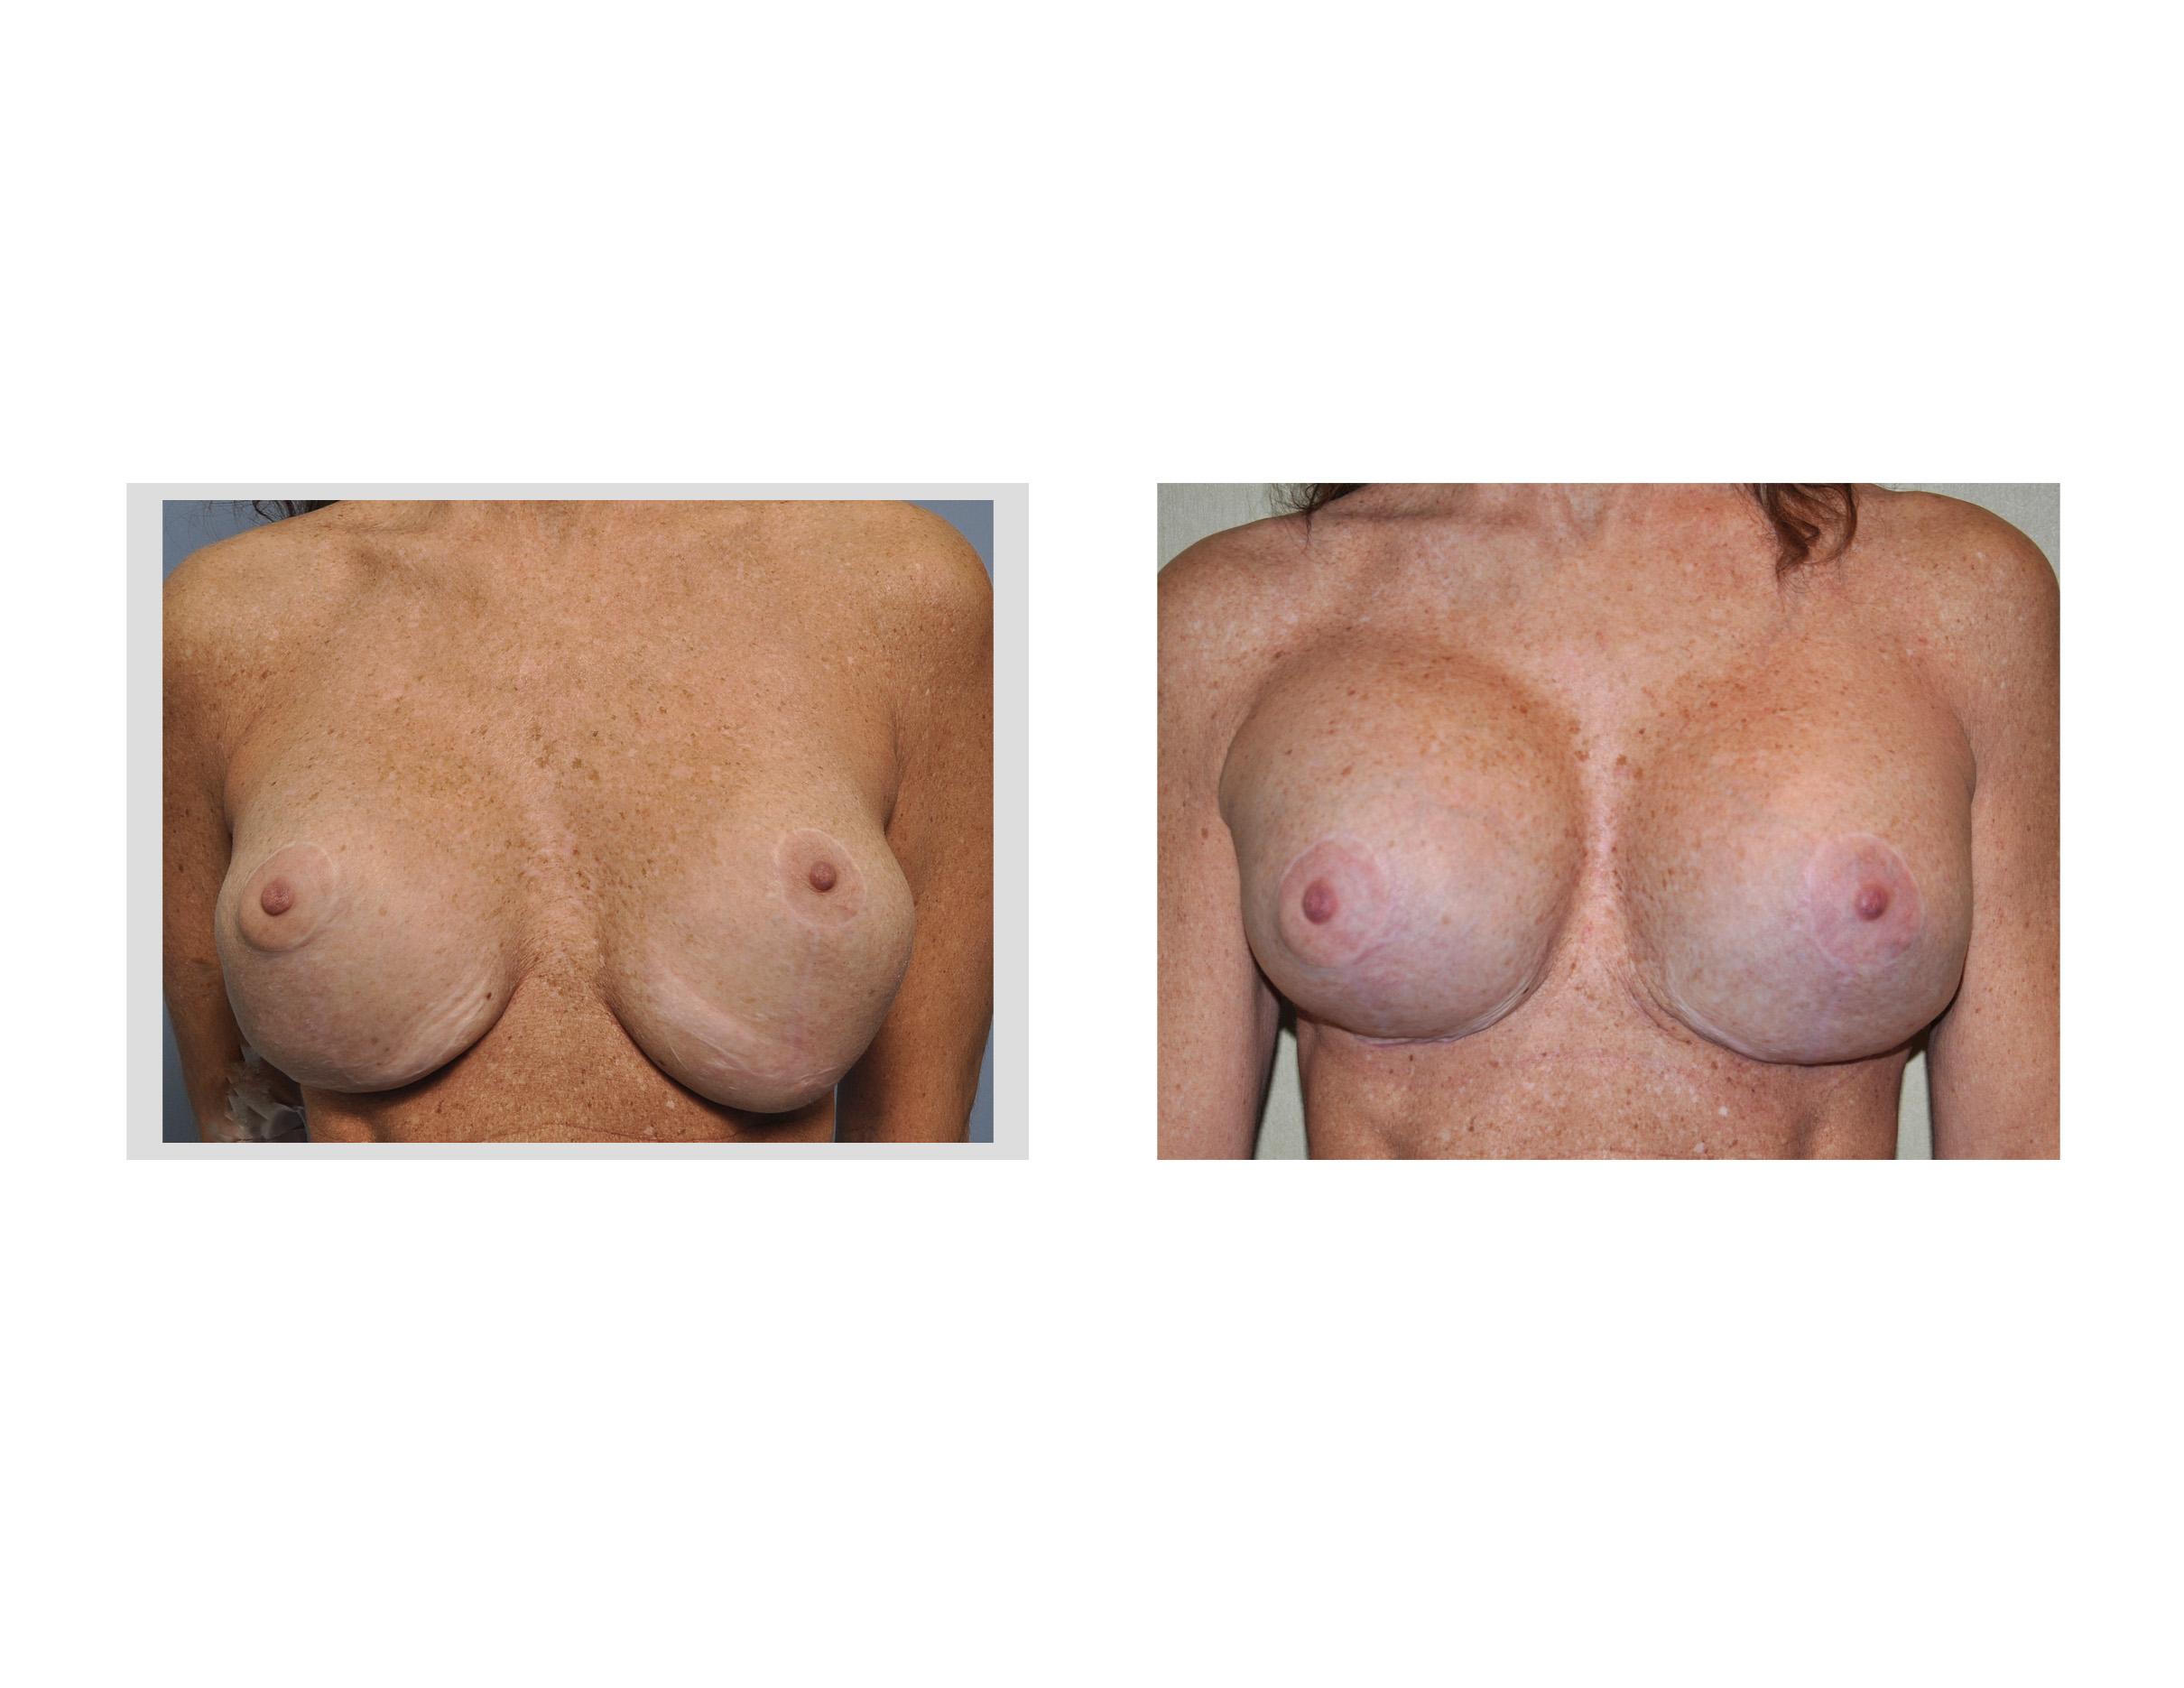 breast transplant surgery